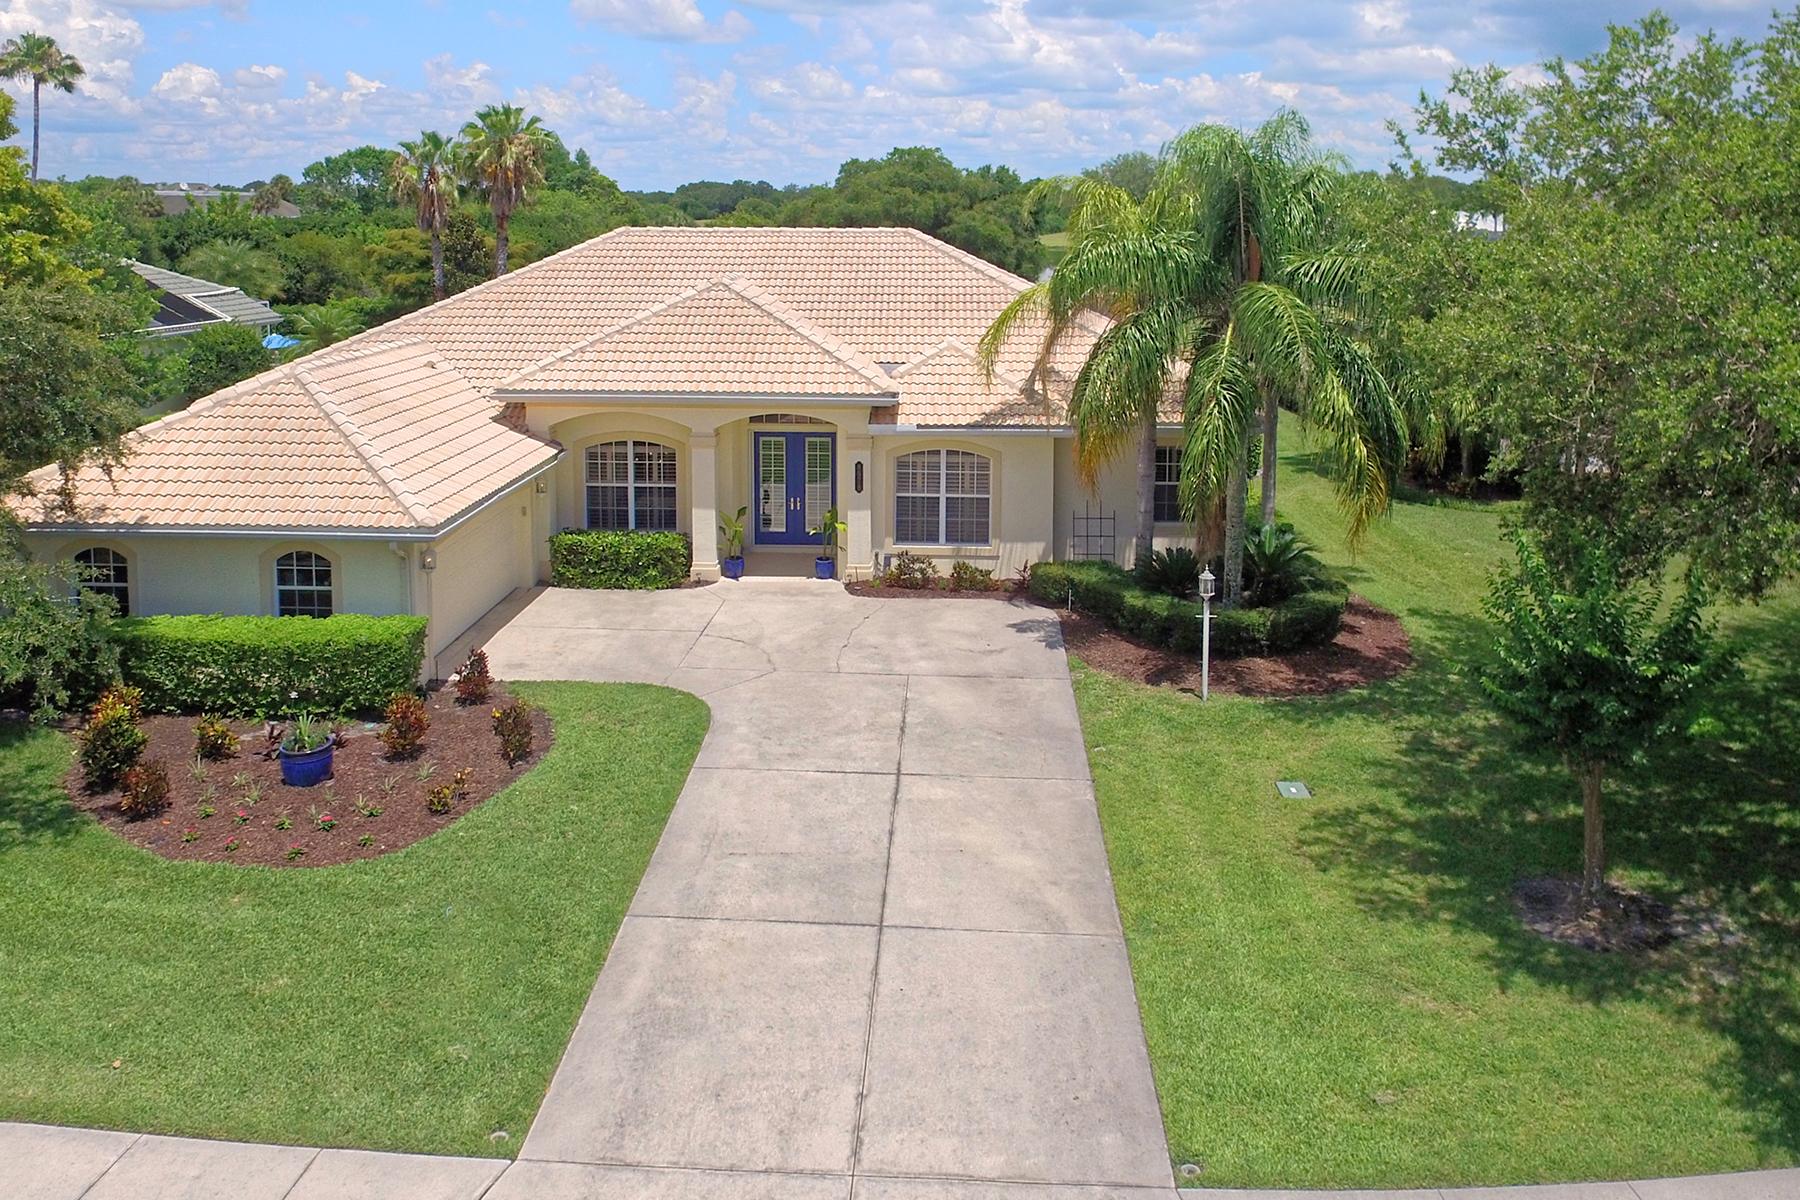 Single Family Home for Sale at MISTY CREEK 8978 Misty Creek Dr Sarasota, Florida, 34241 United States